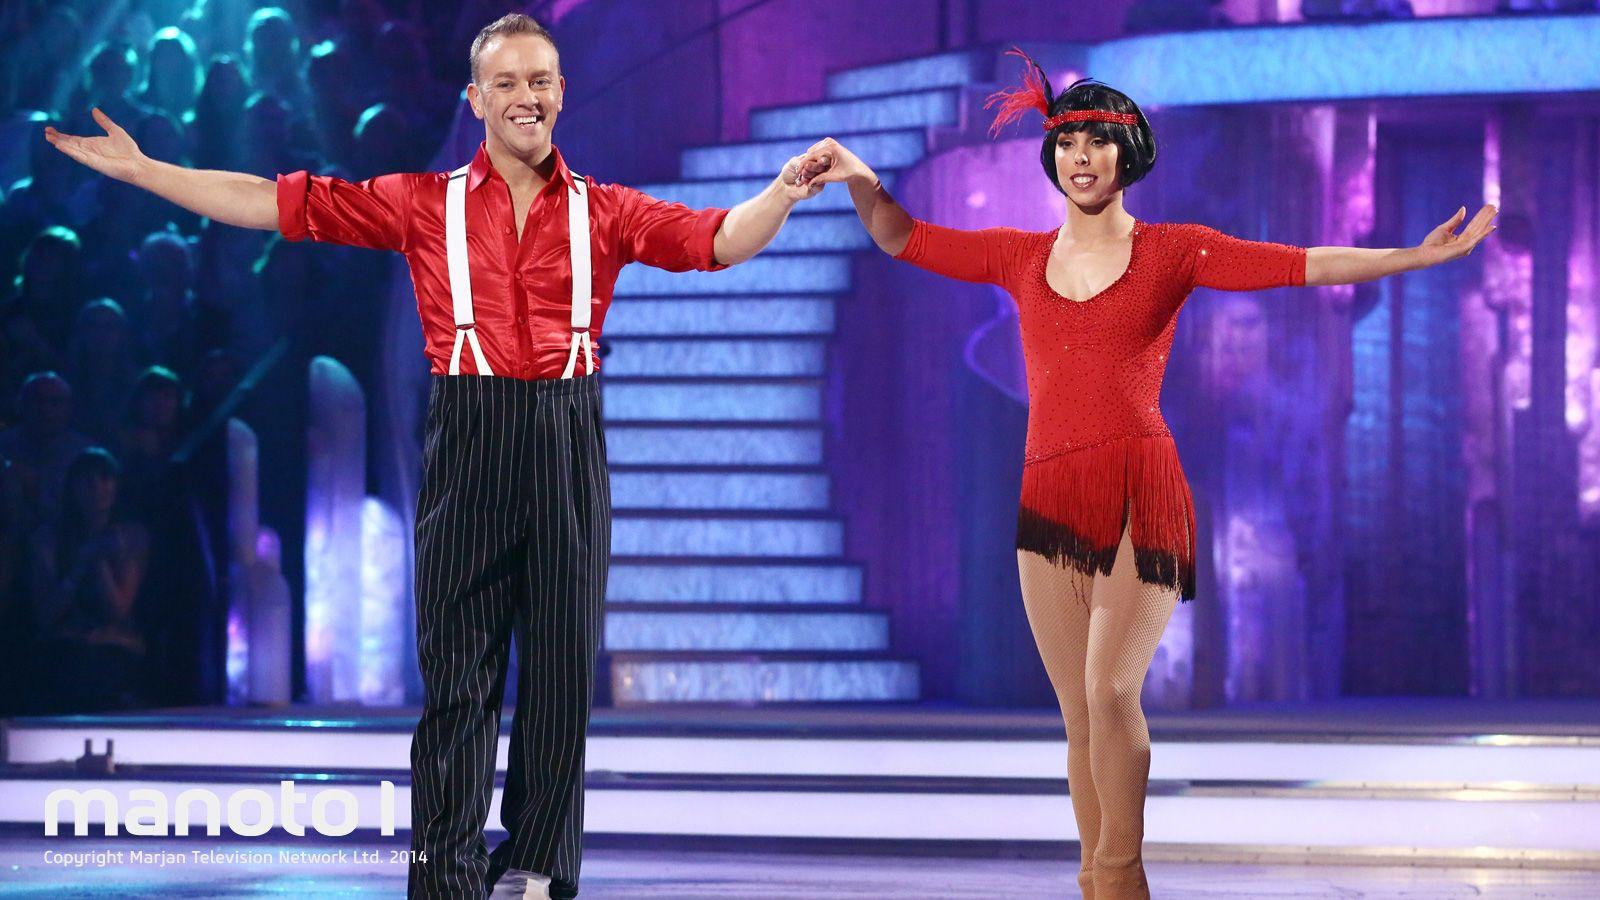 #dancingonice